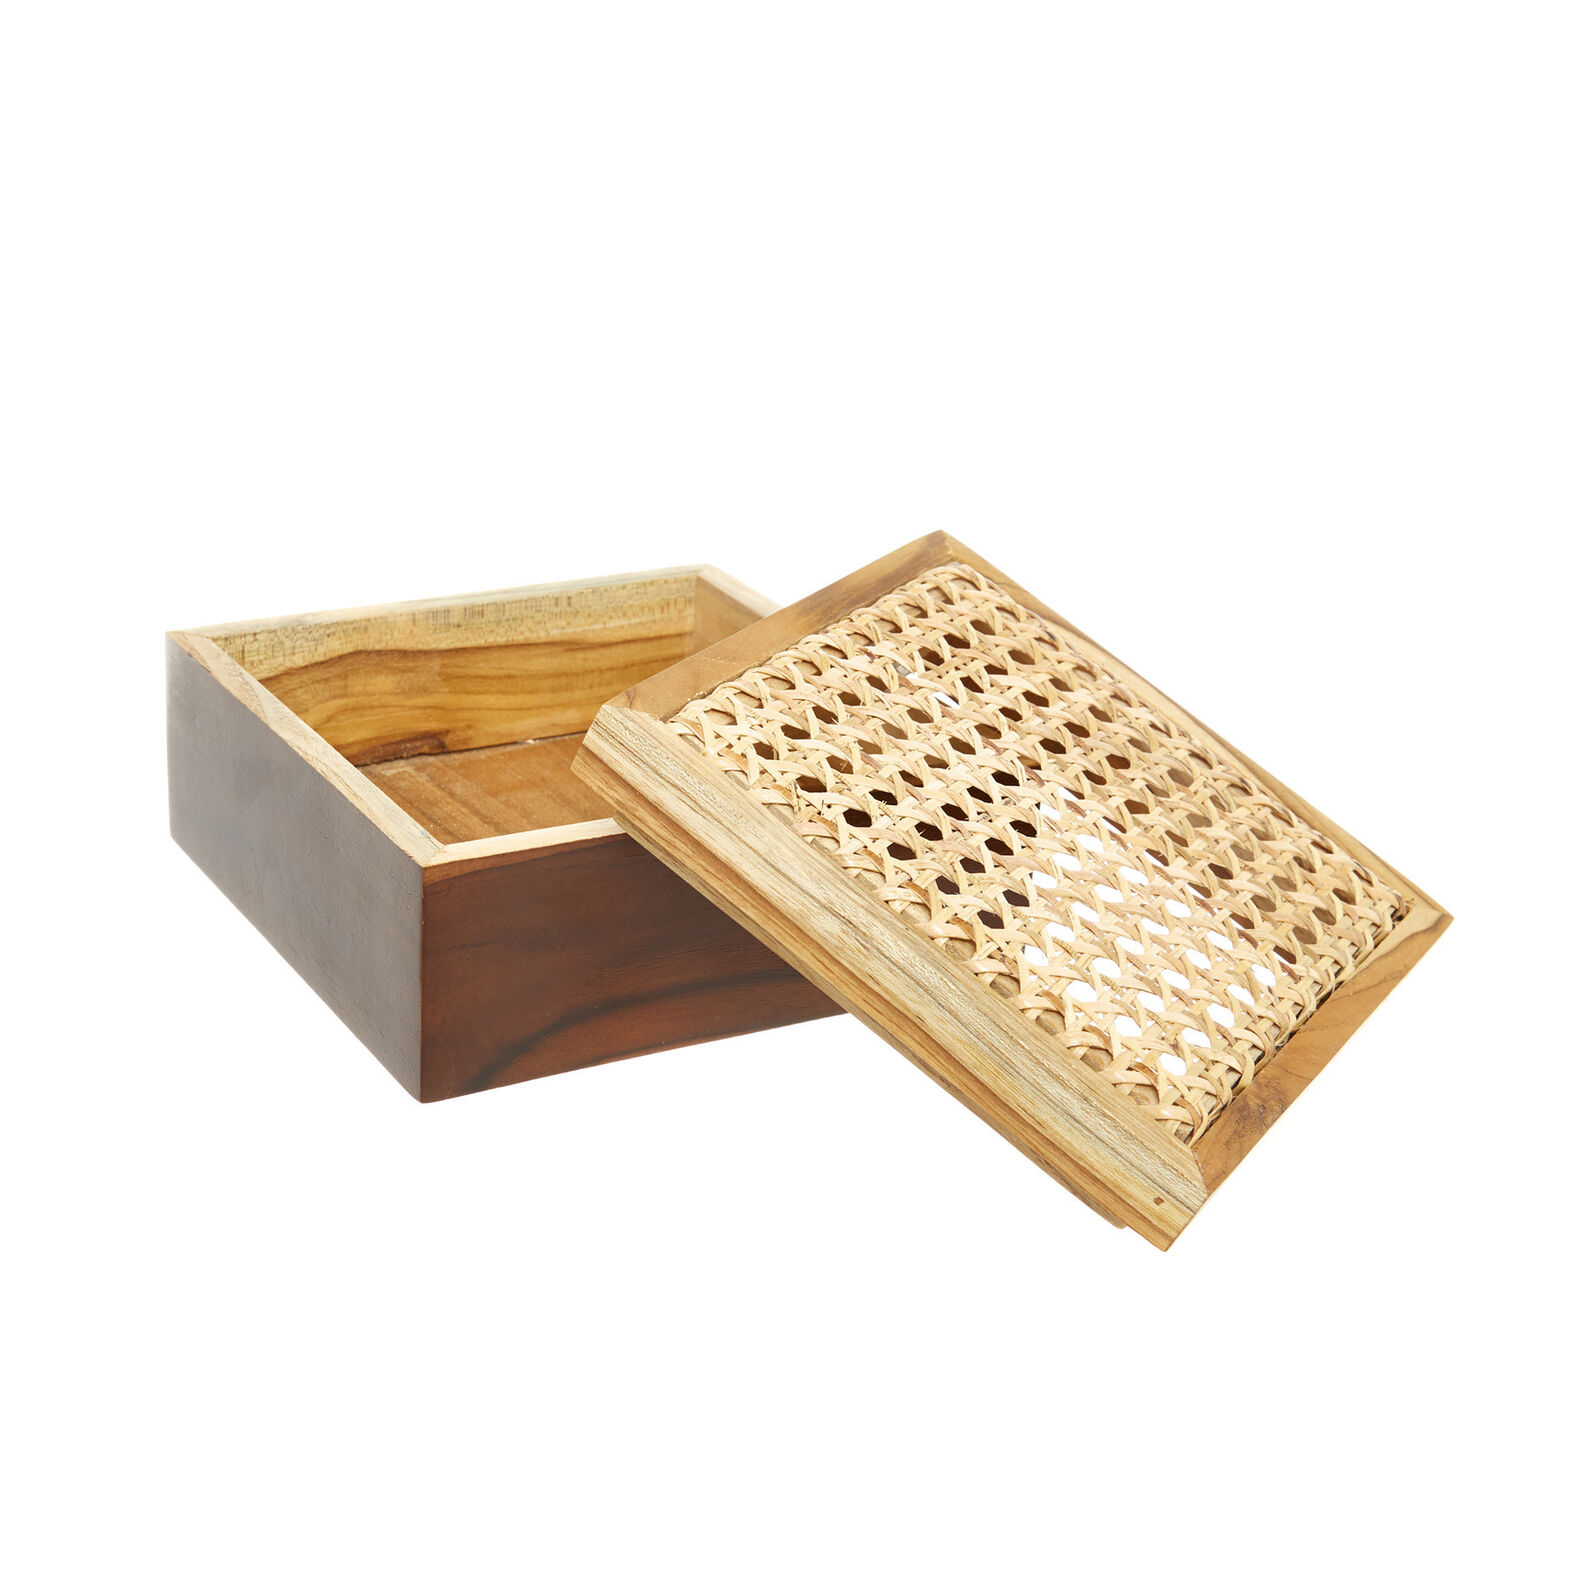 Rattan and teak box